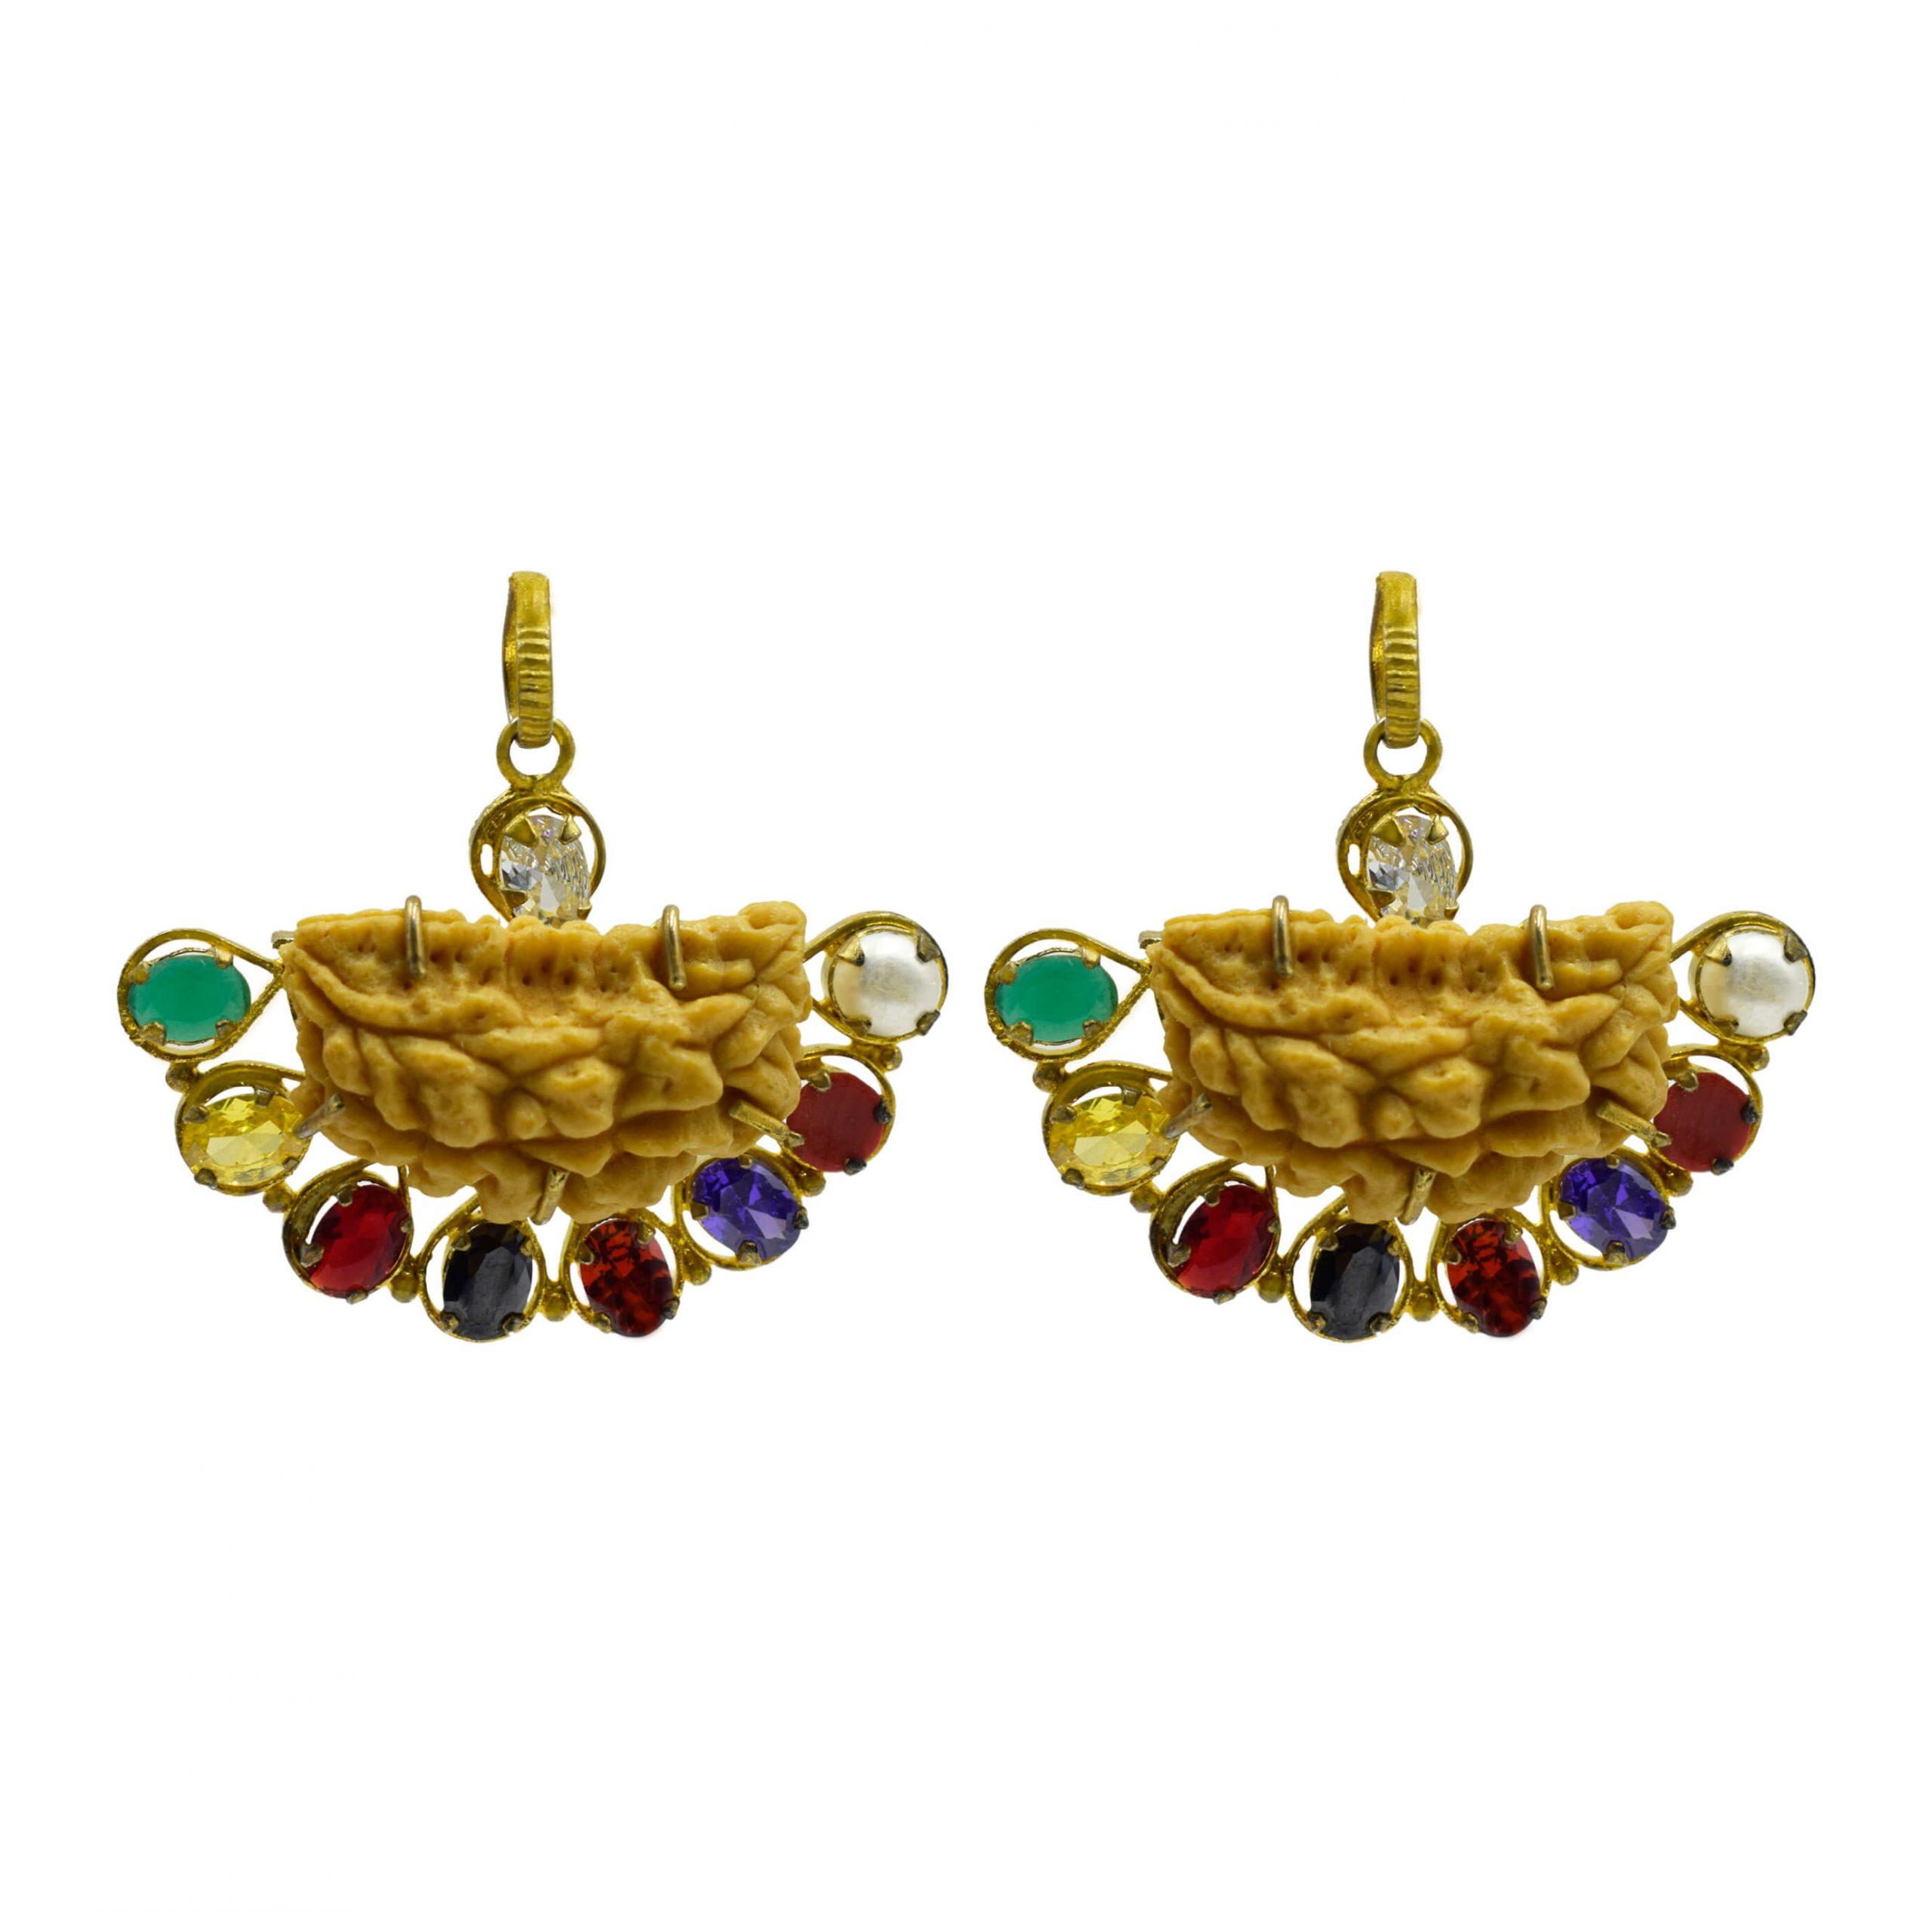 Buy Online Combo of Navgrah Pendant With Rudraksha